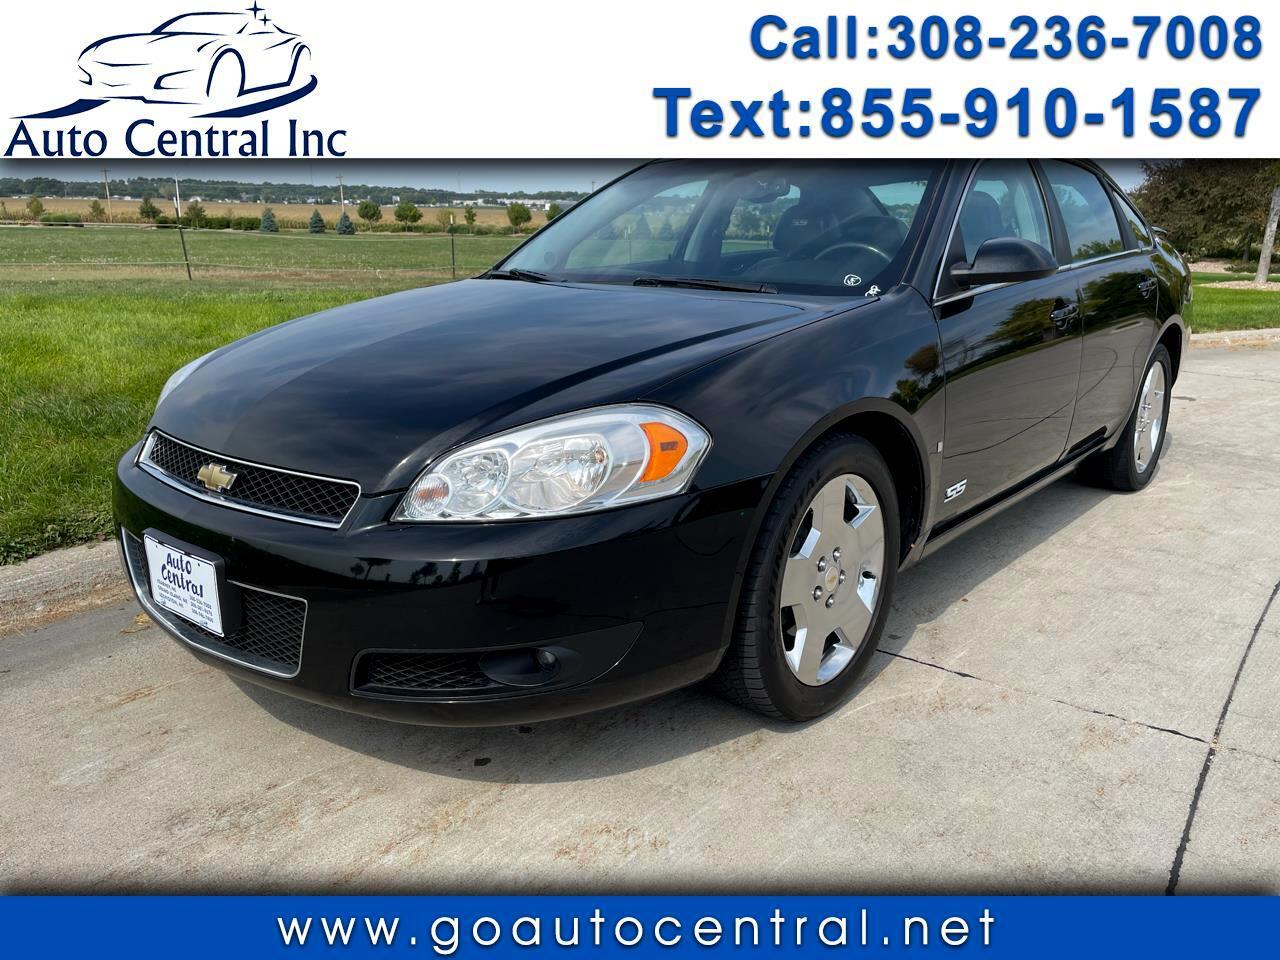 2008 Chevrolet Impala 4dr Sdn SS